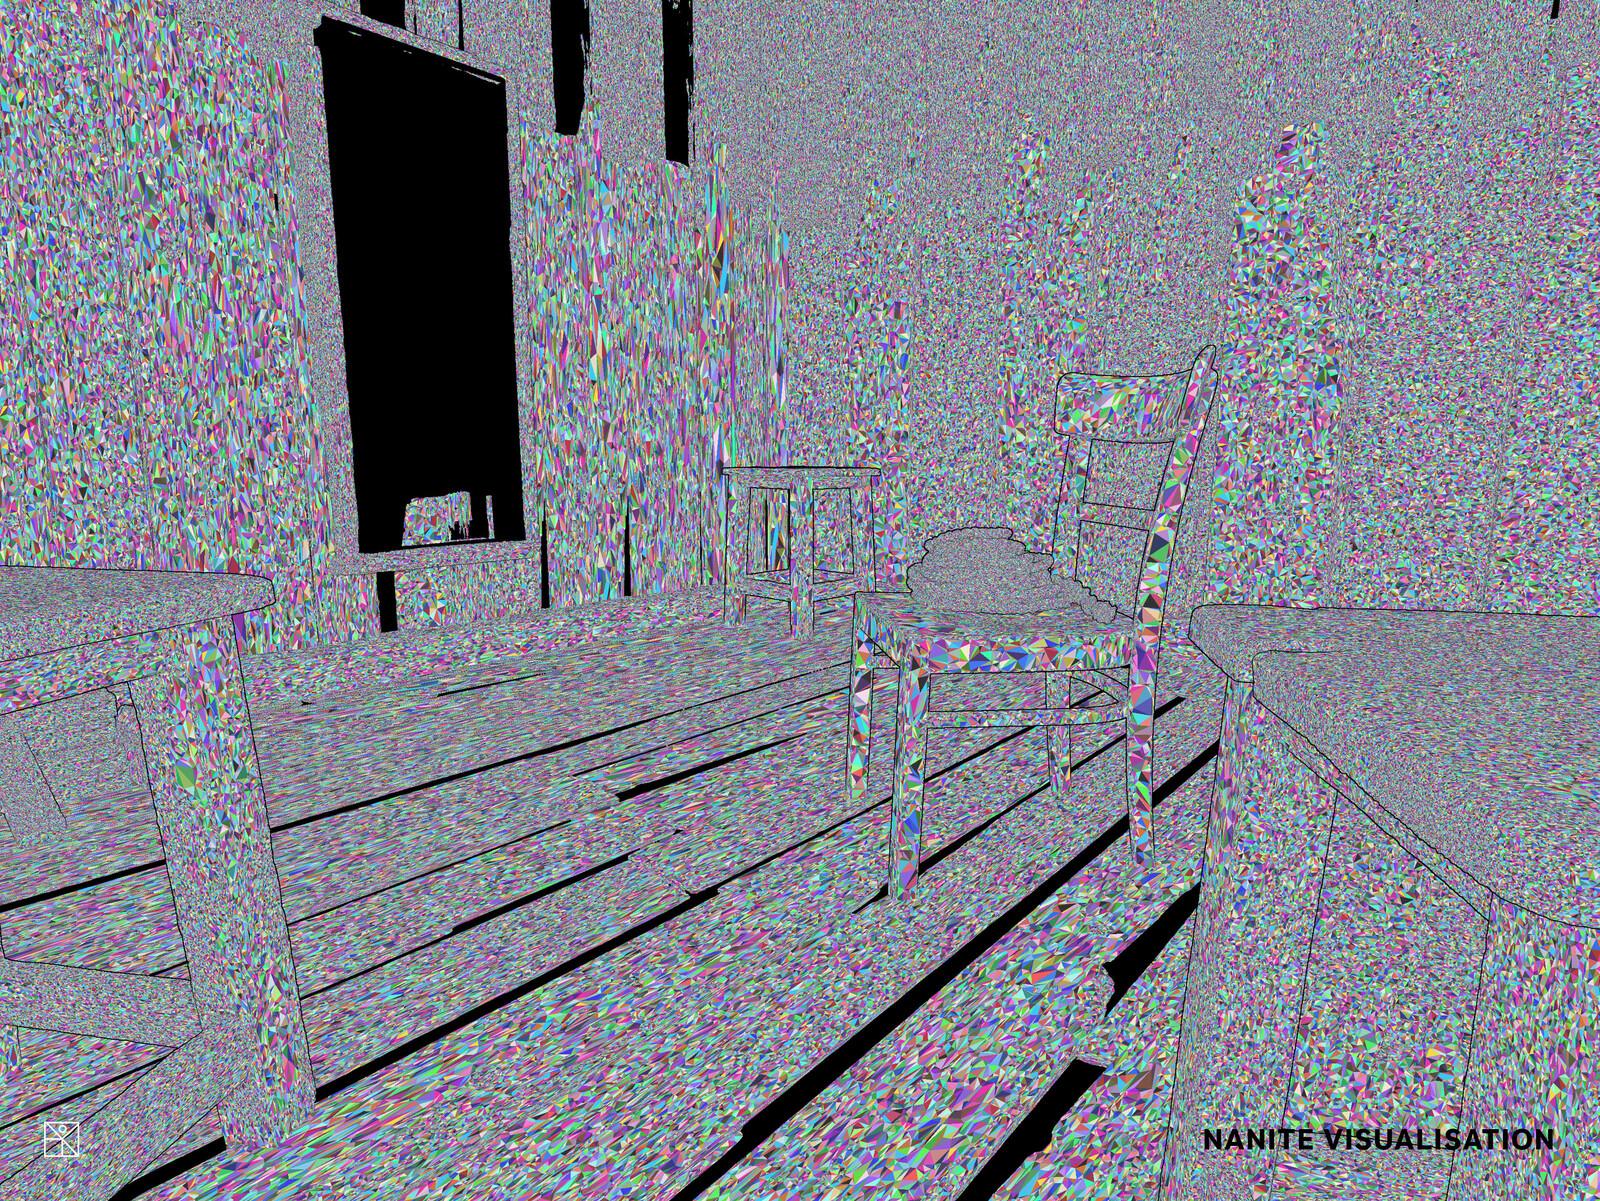 Nanite Visualisation